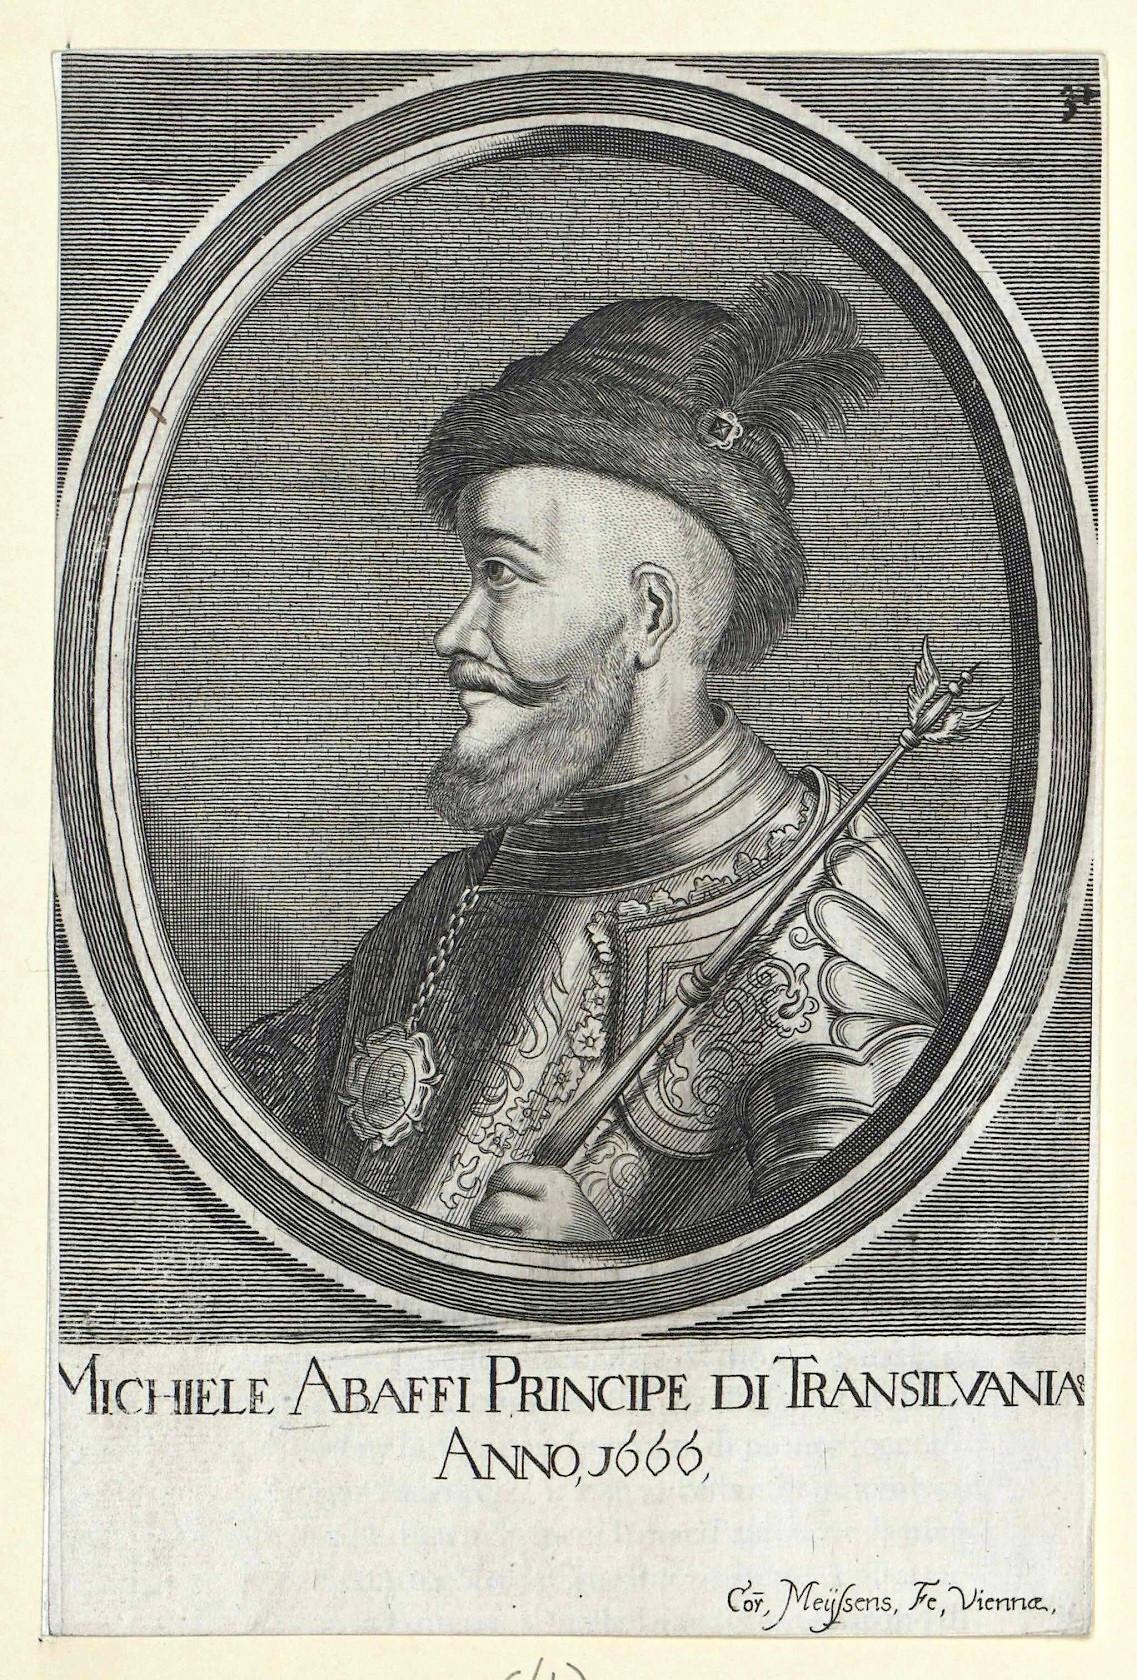 michiele_abaffi_principe_di_transilvania_anno_1666.jpeg